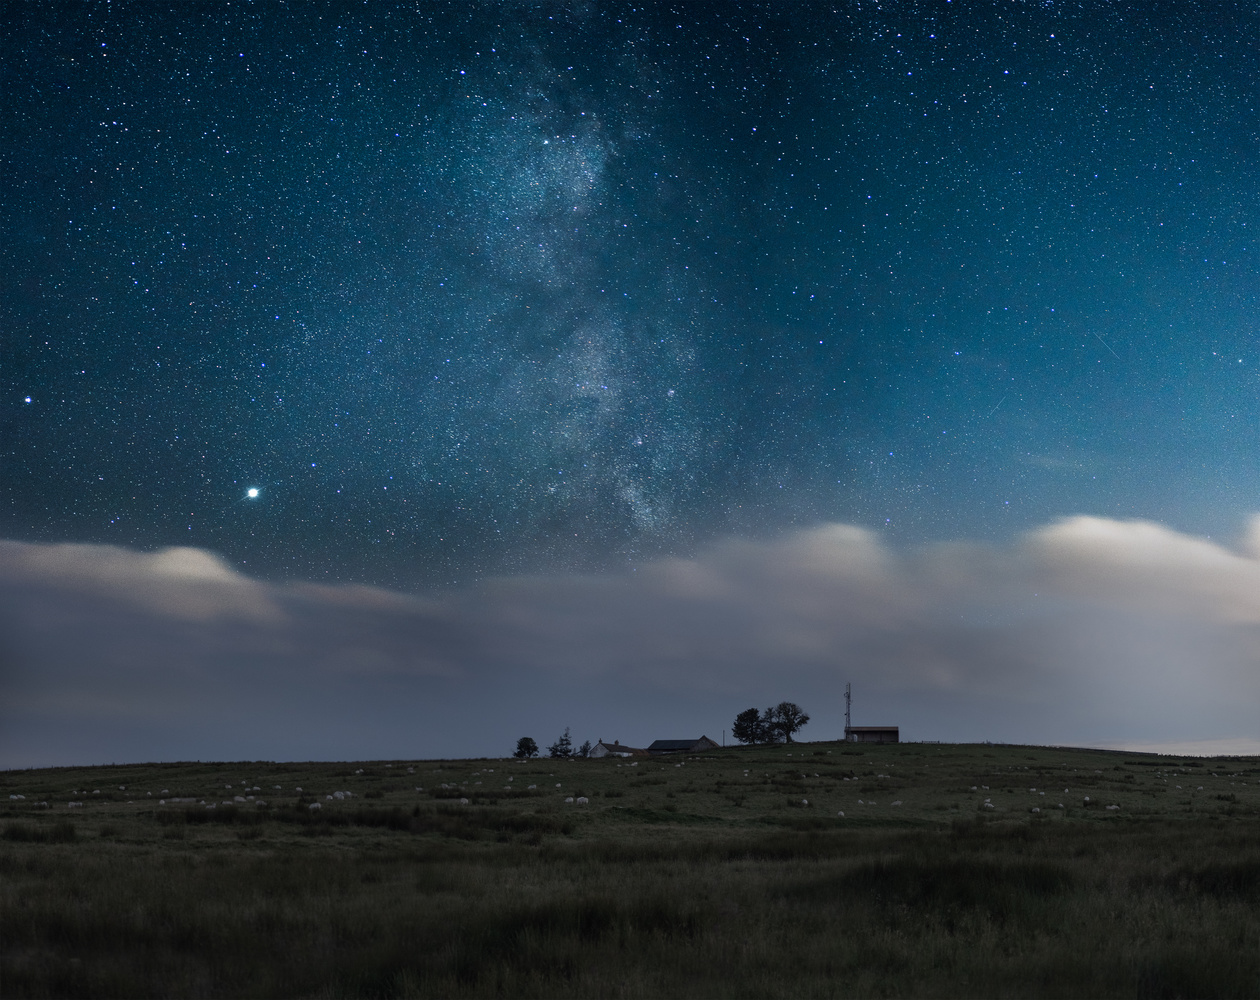 Milky Way rising above a scottish farm by Kevin Skeldon